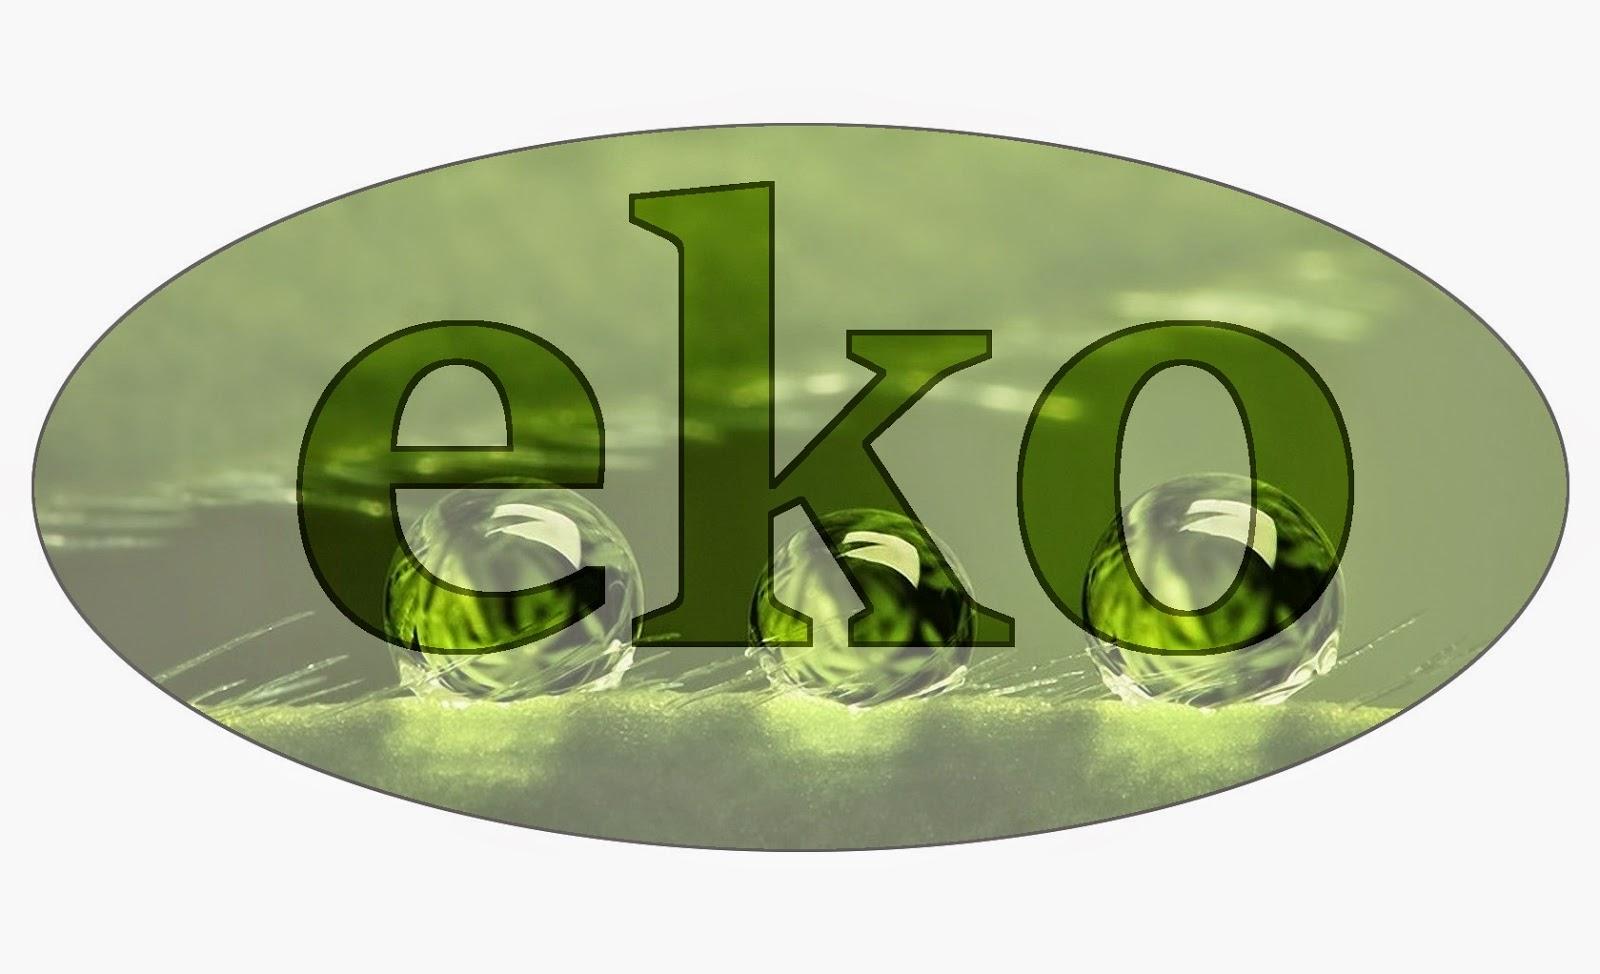 Ochrona środowiska, tel 502 032 782,